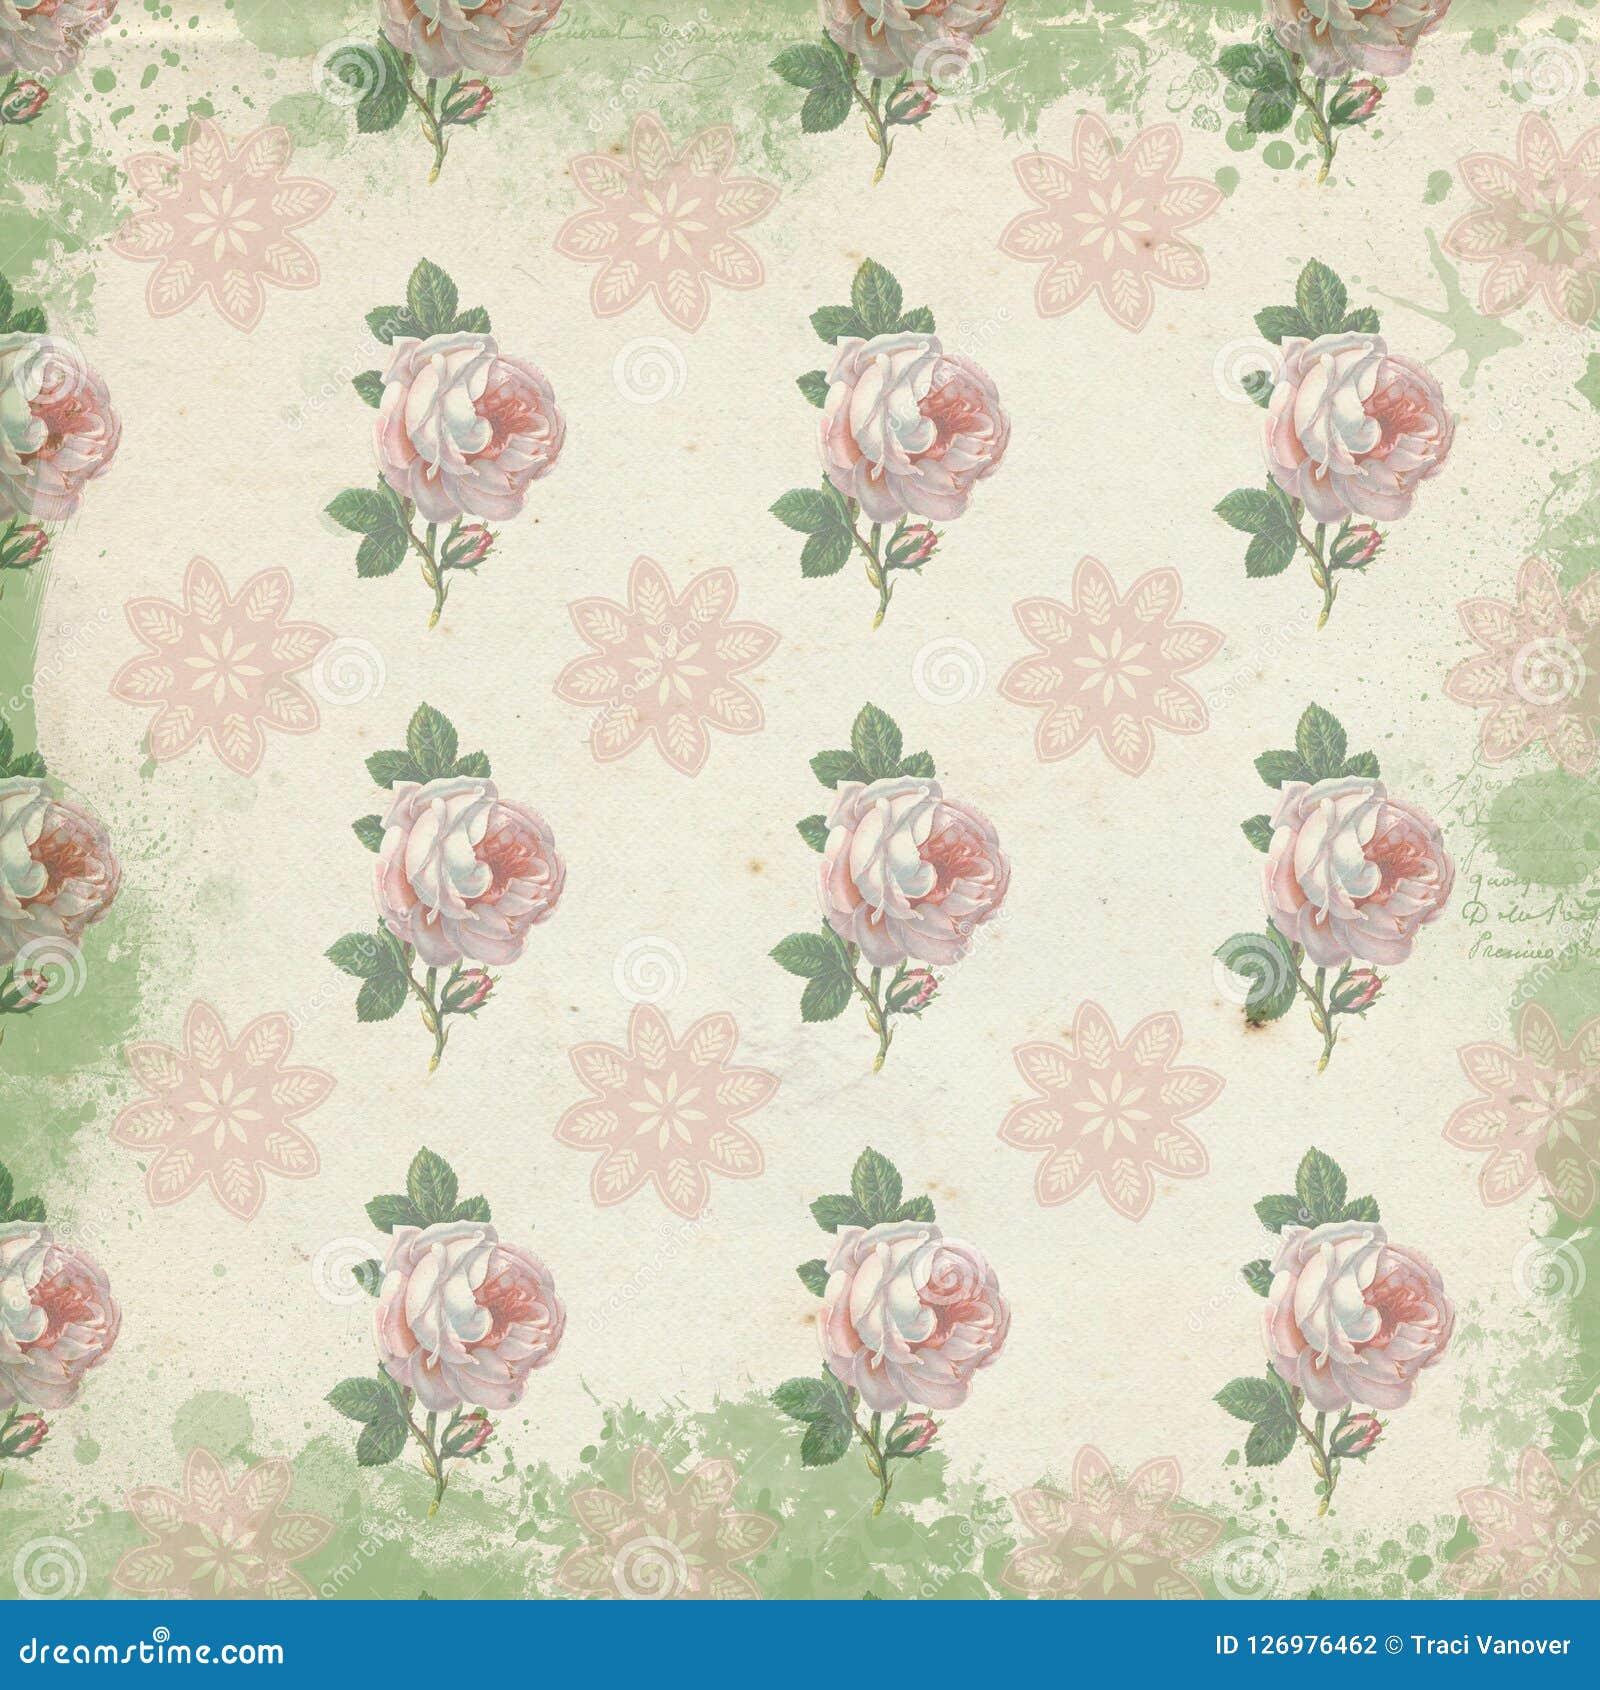 Tremendous Vintage Digital Paper Background Texture Shabby Chic Interior Design Ideas Lukepblogthenellocom